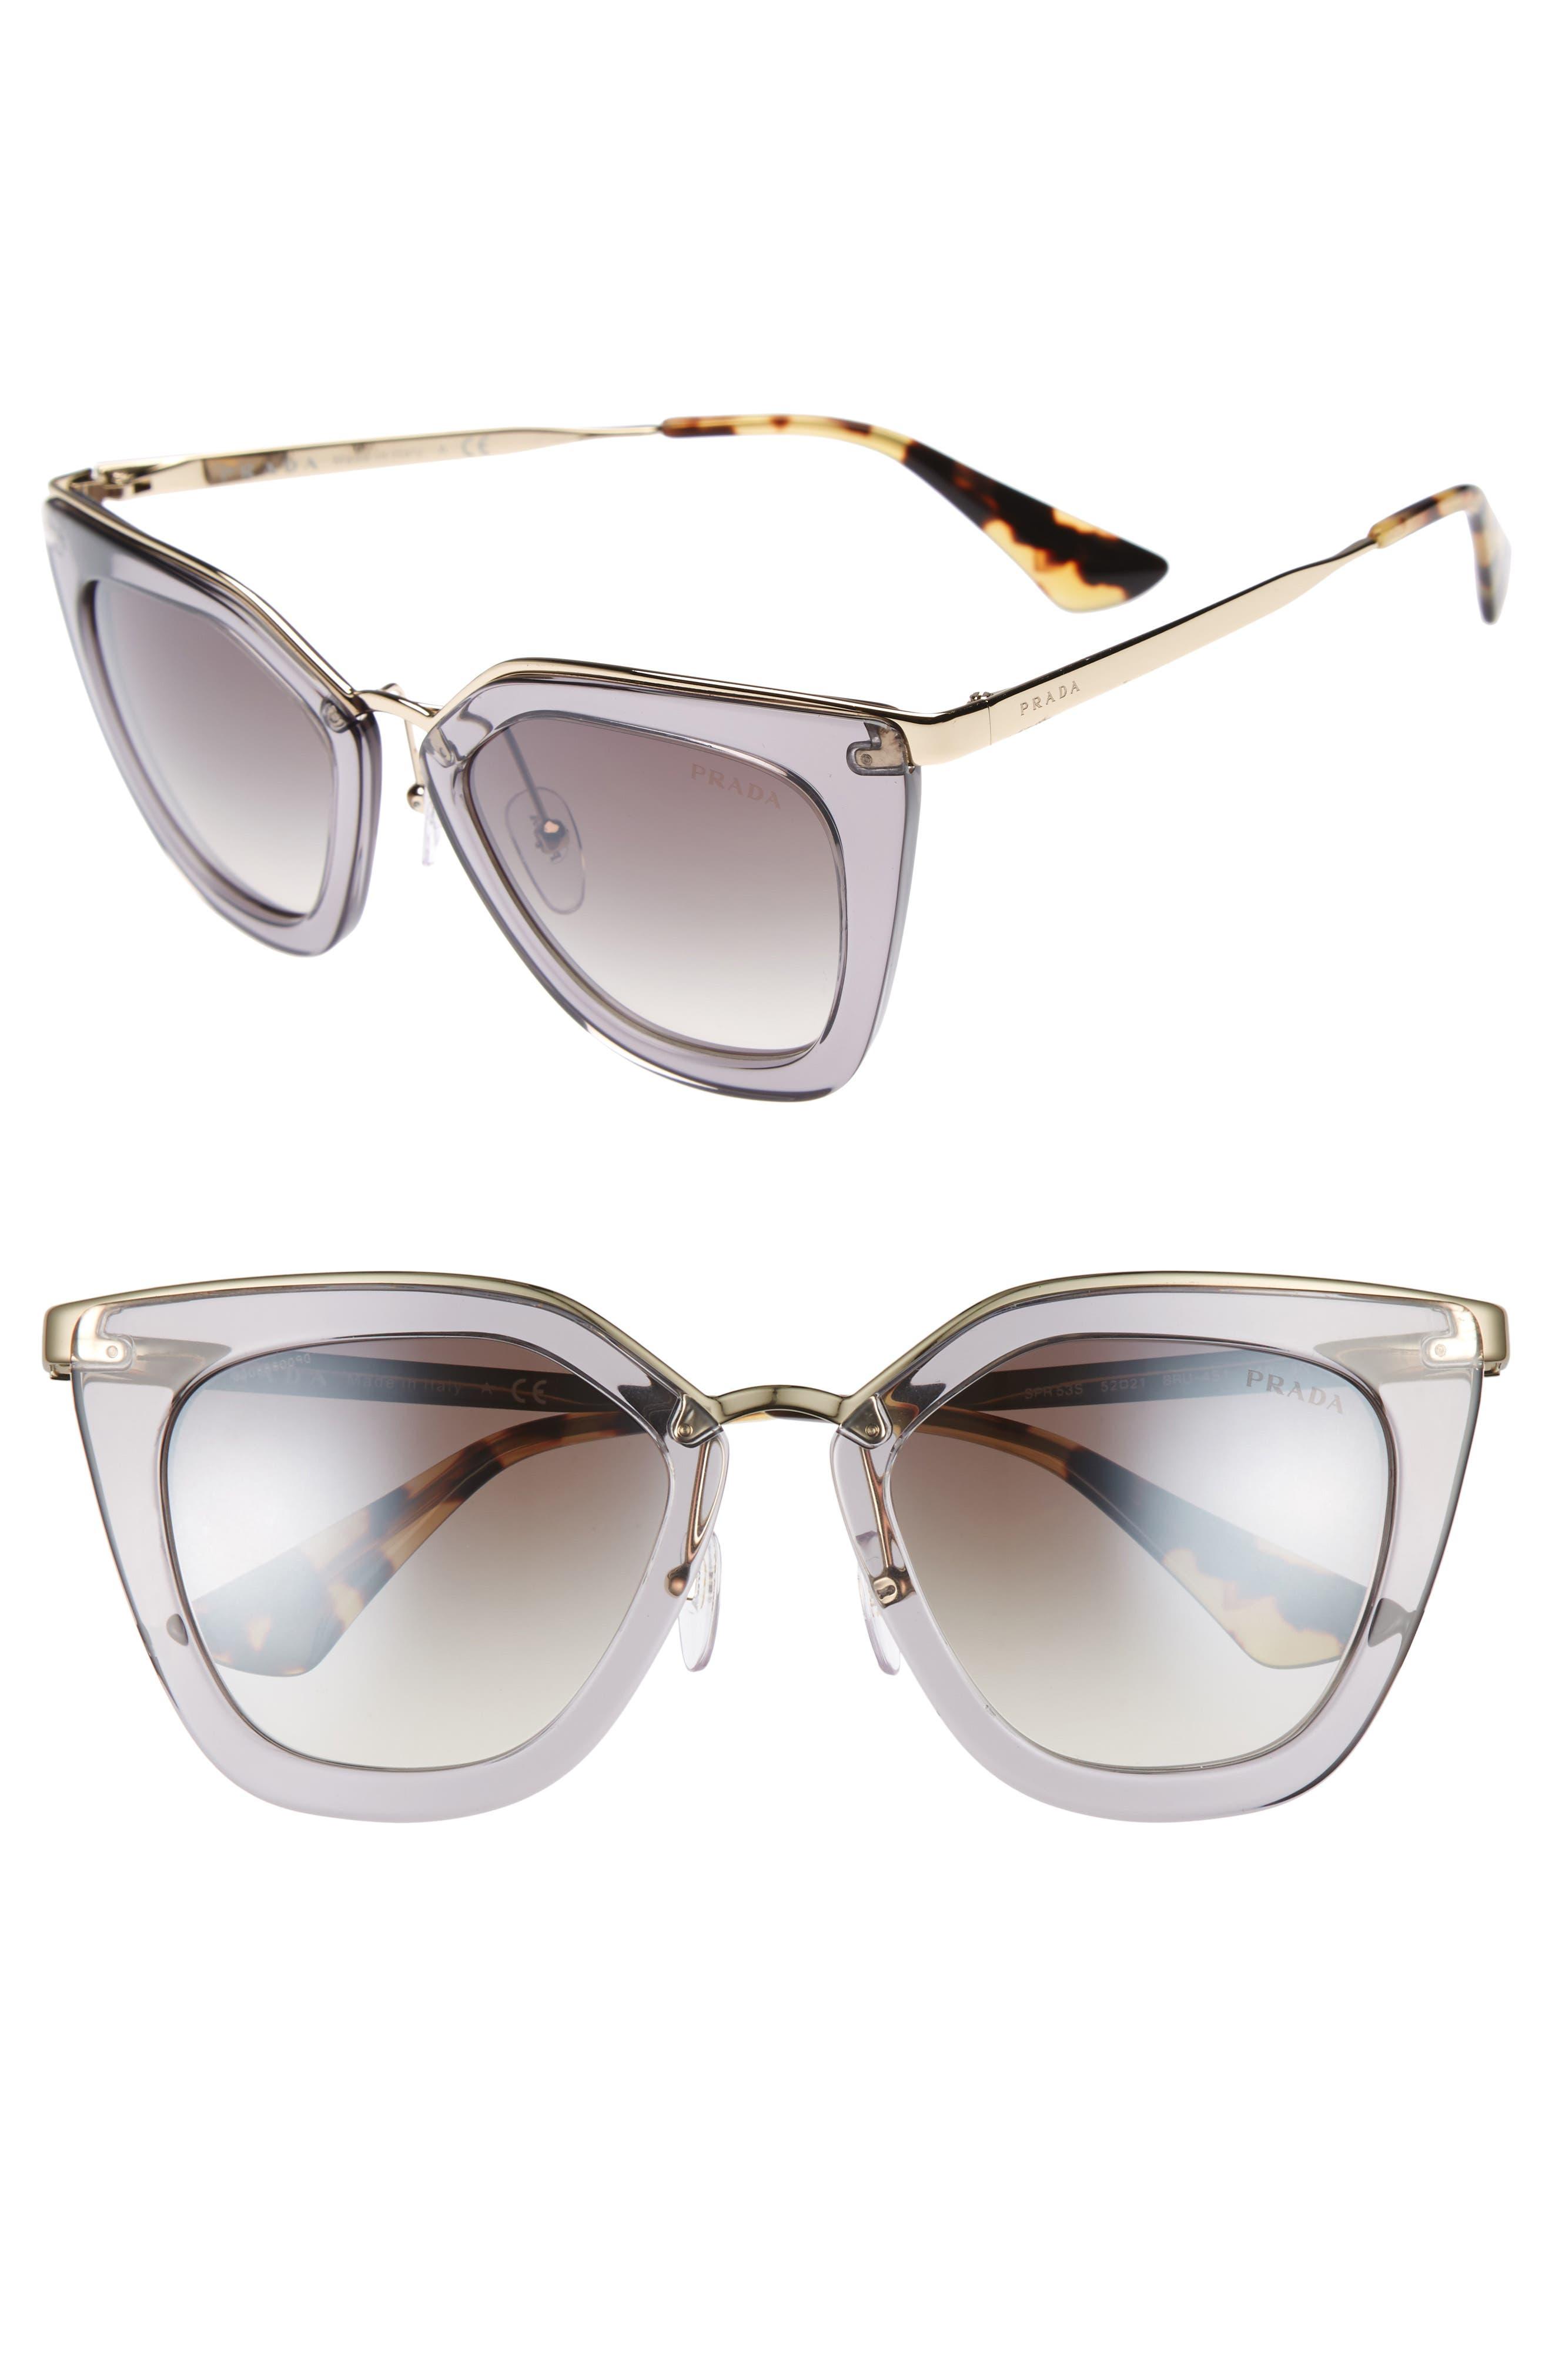 52mm Gradient Cat Eye Sunglasses,                             Main thumbnail 1, color,                             Transparent Grey